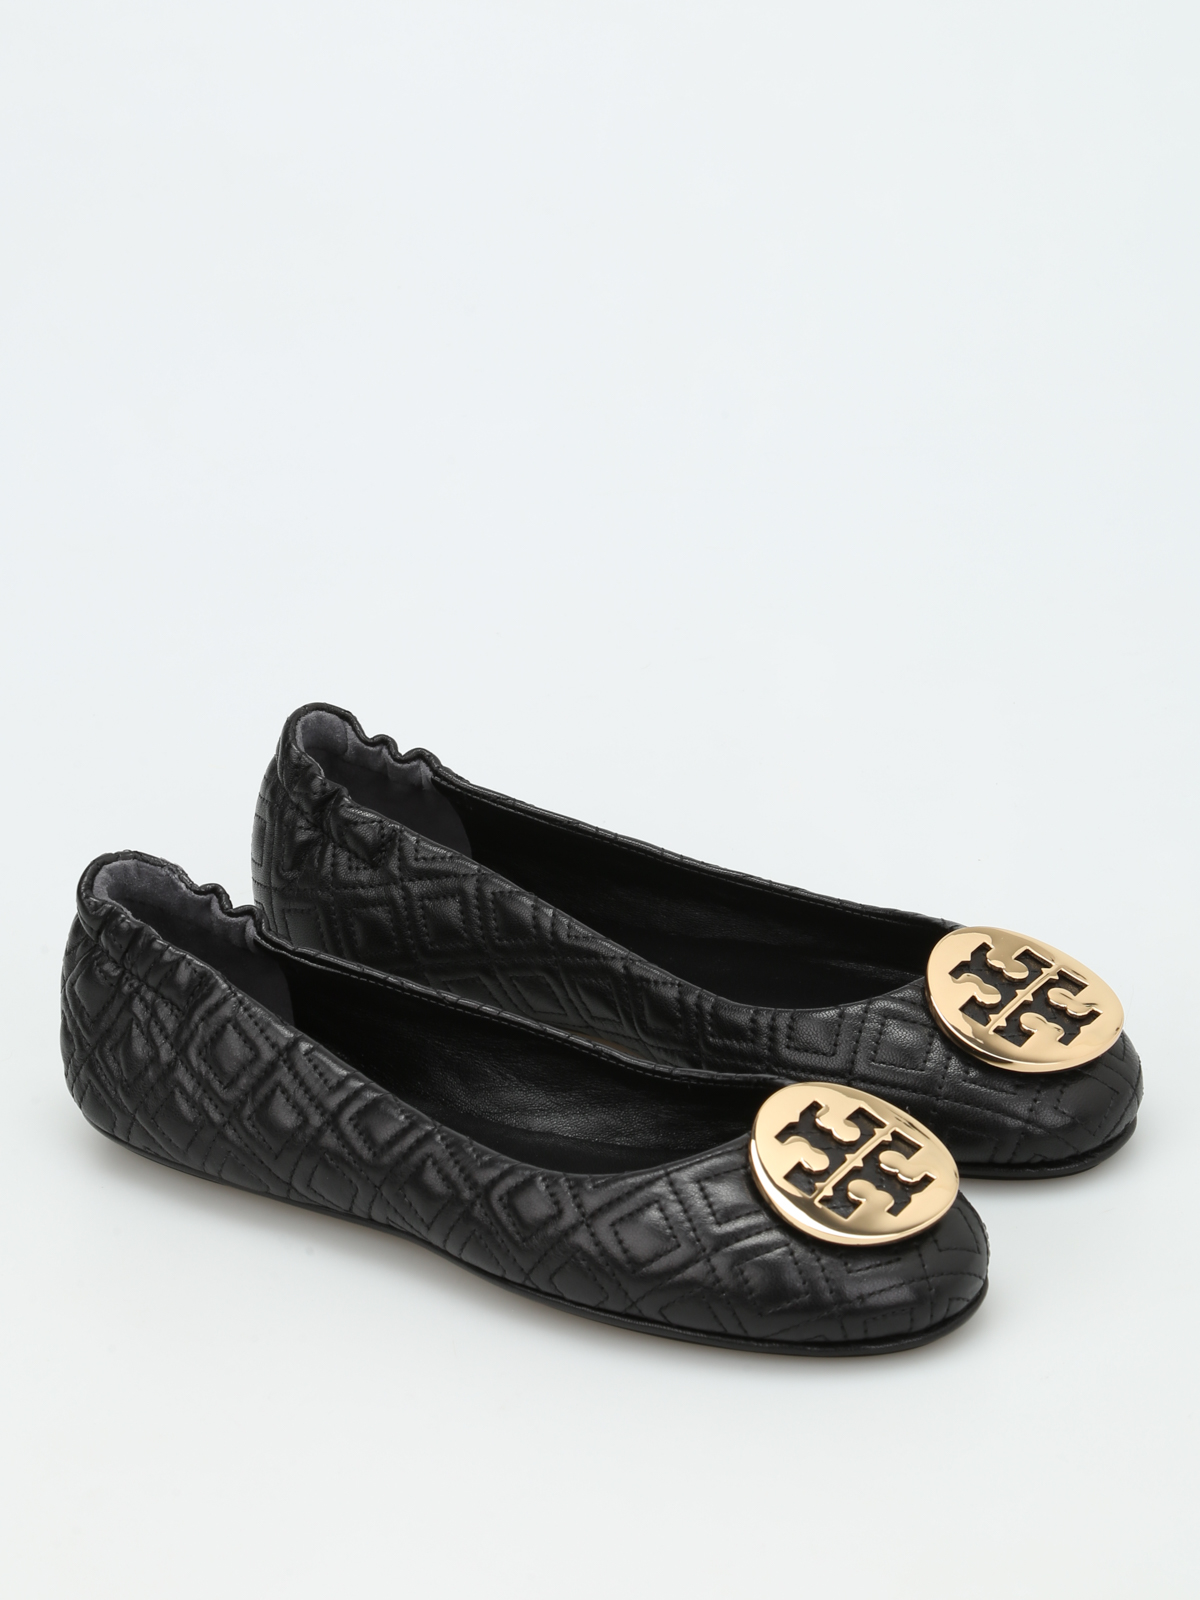 Minnie Folding Flats By Tory Burch - Flat Shoes | IKRIX